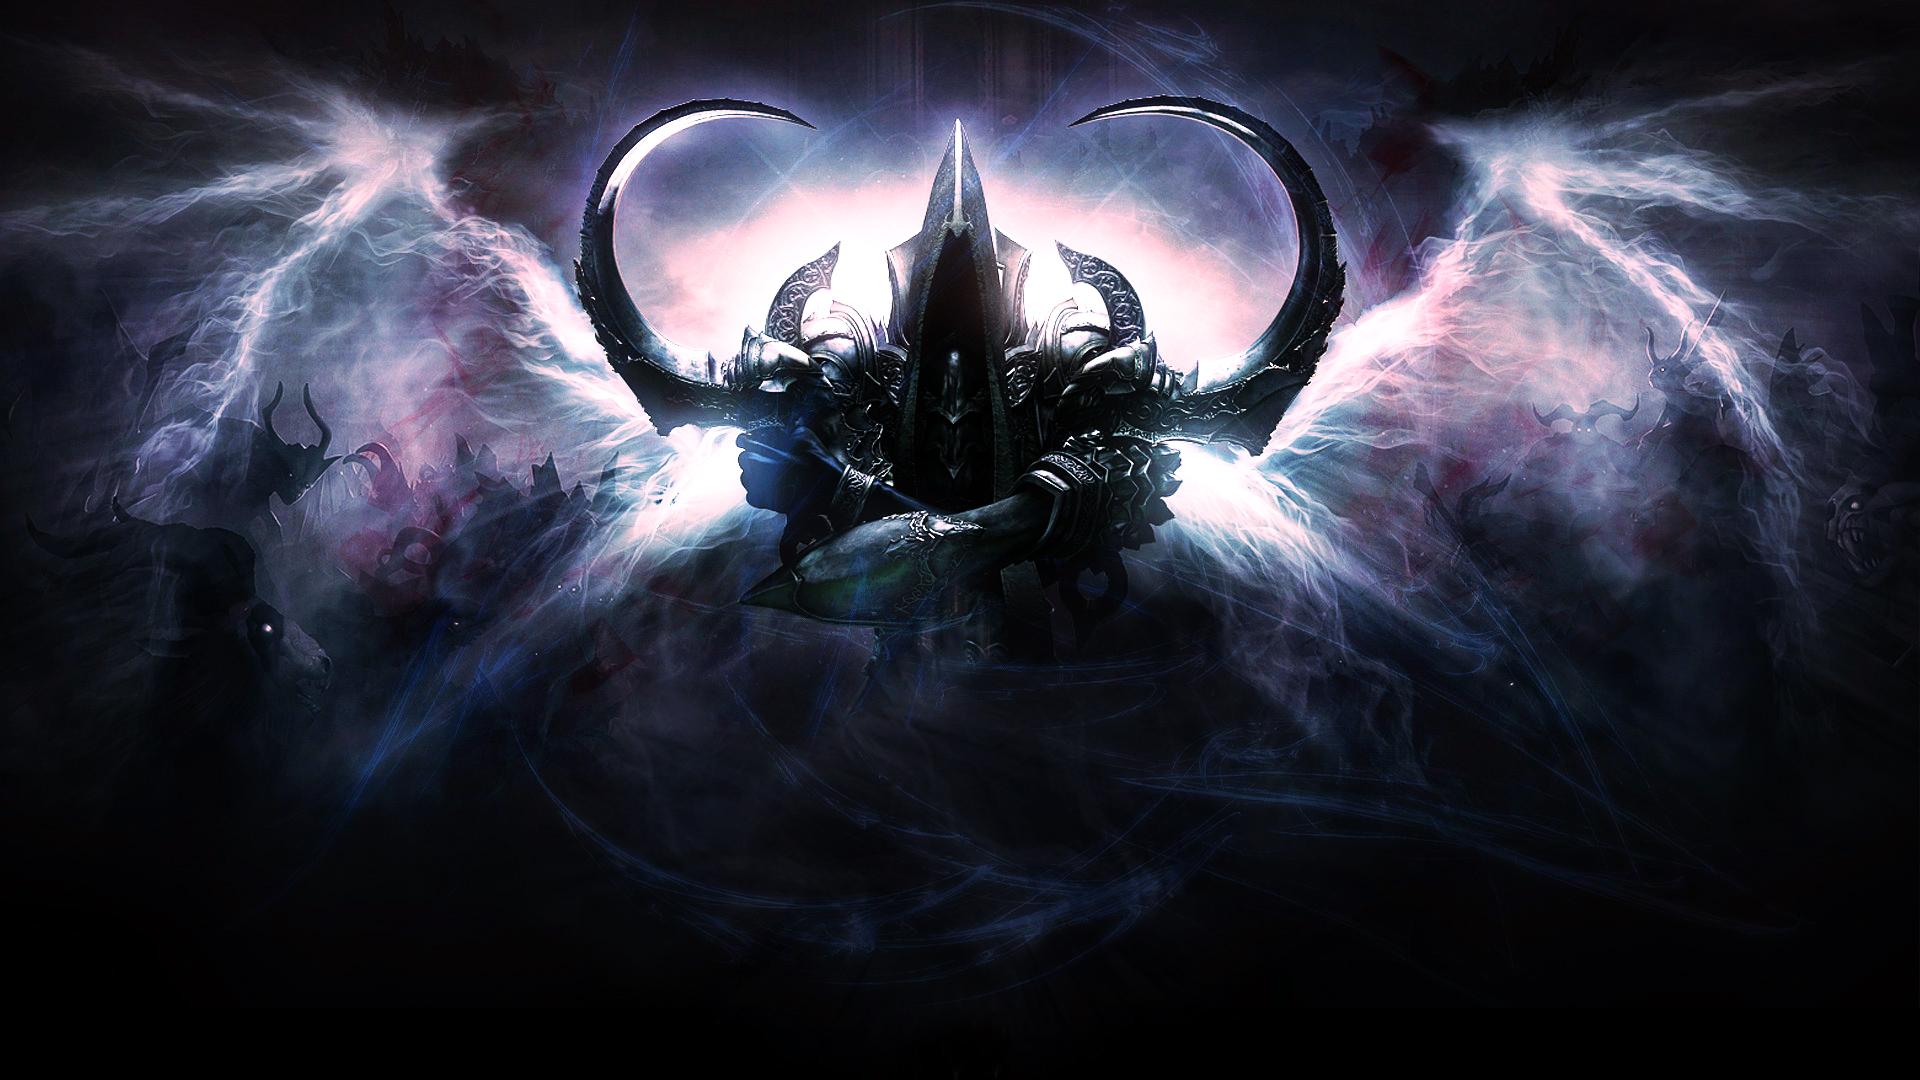 diablo 3 reaper of souls wallpaper by nihilusdesigns on